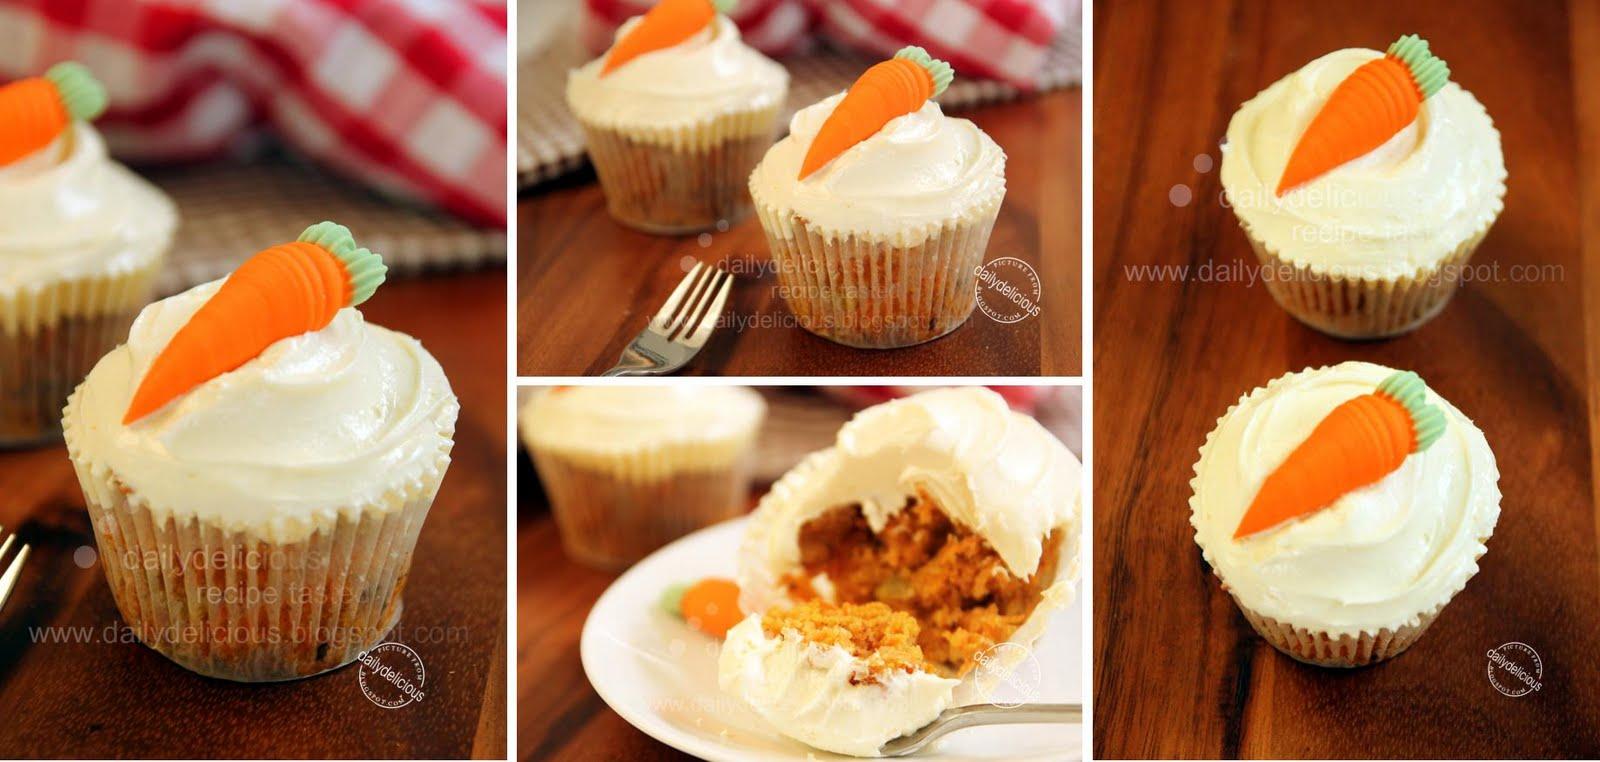 Cute Carrot Cake Cupcakes